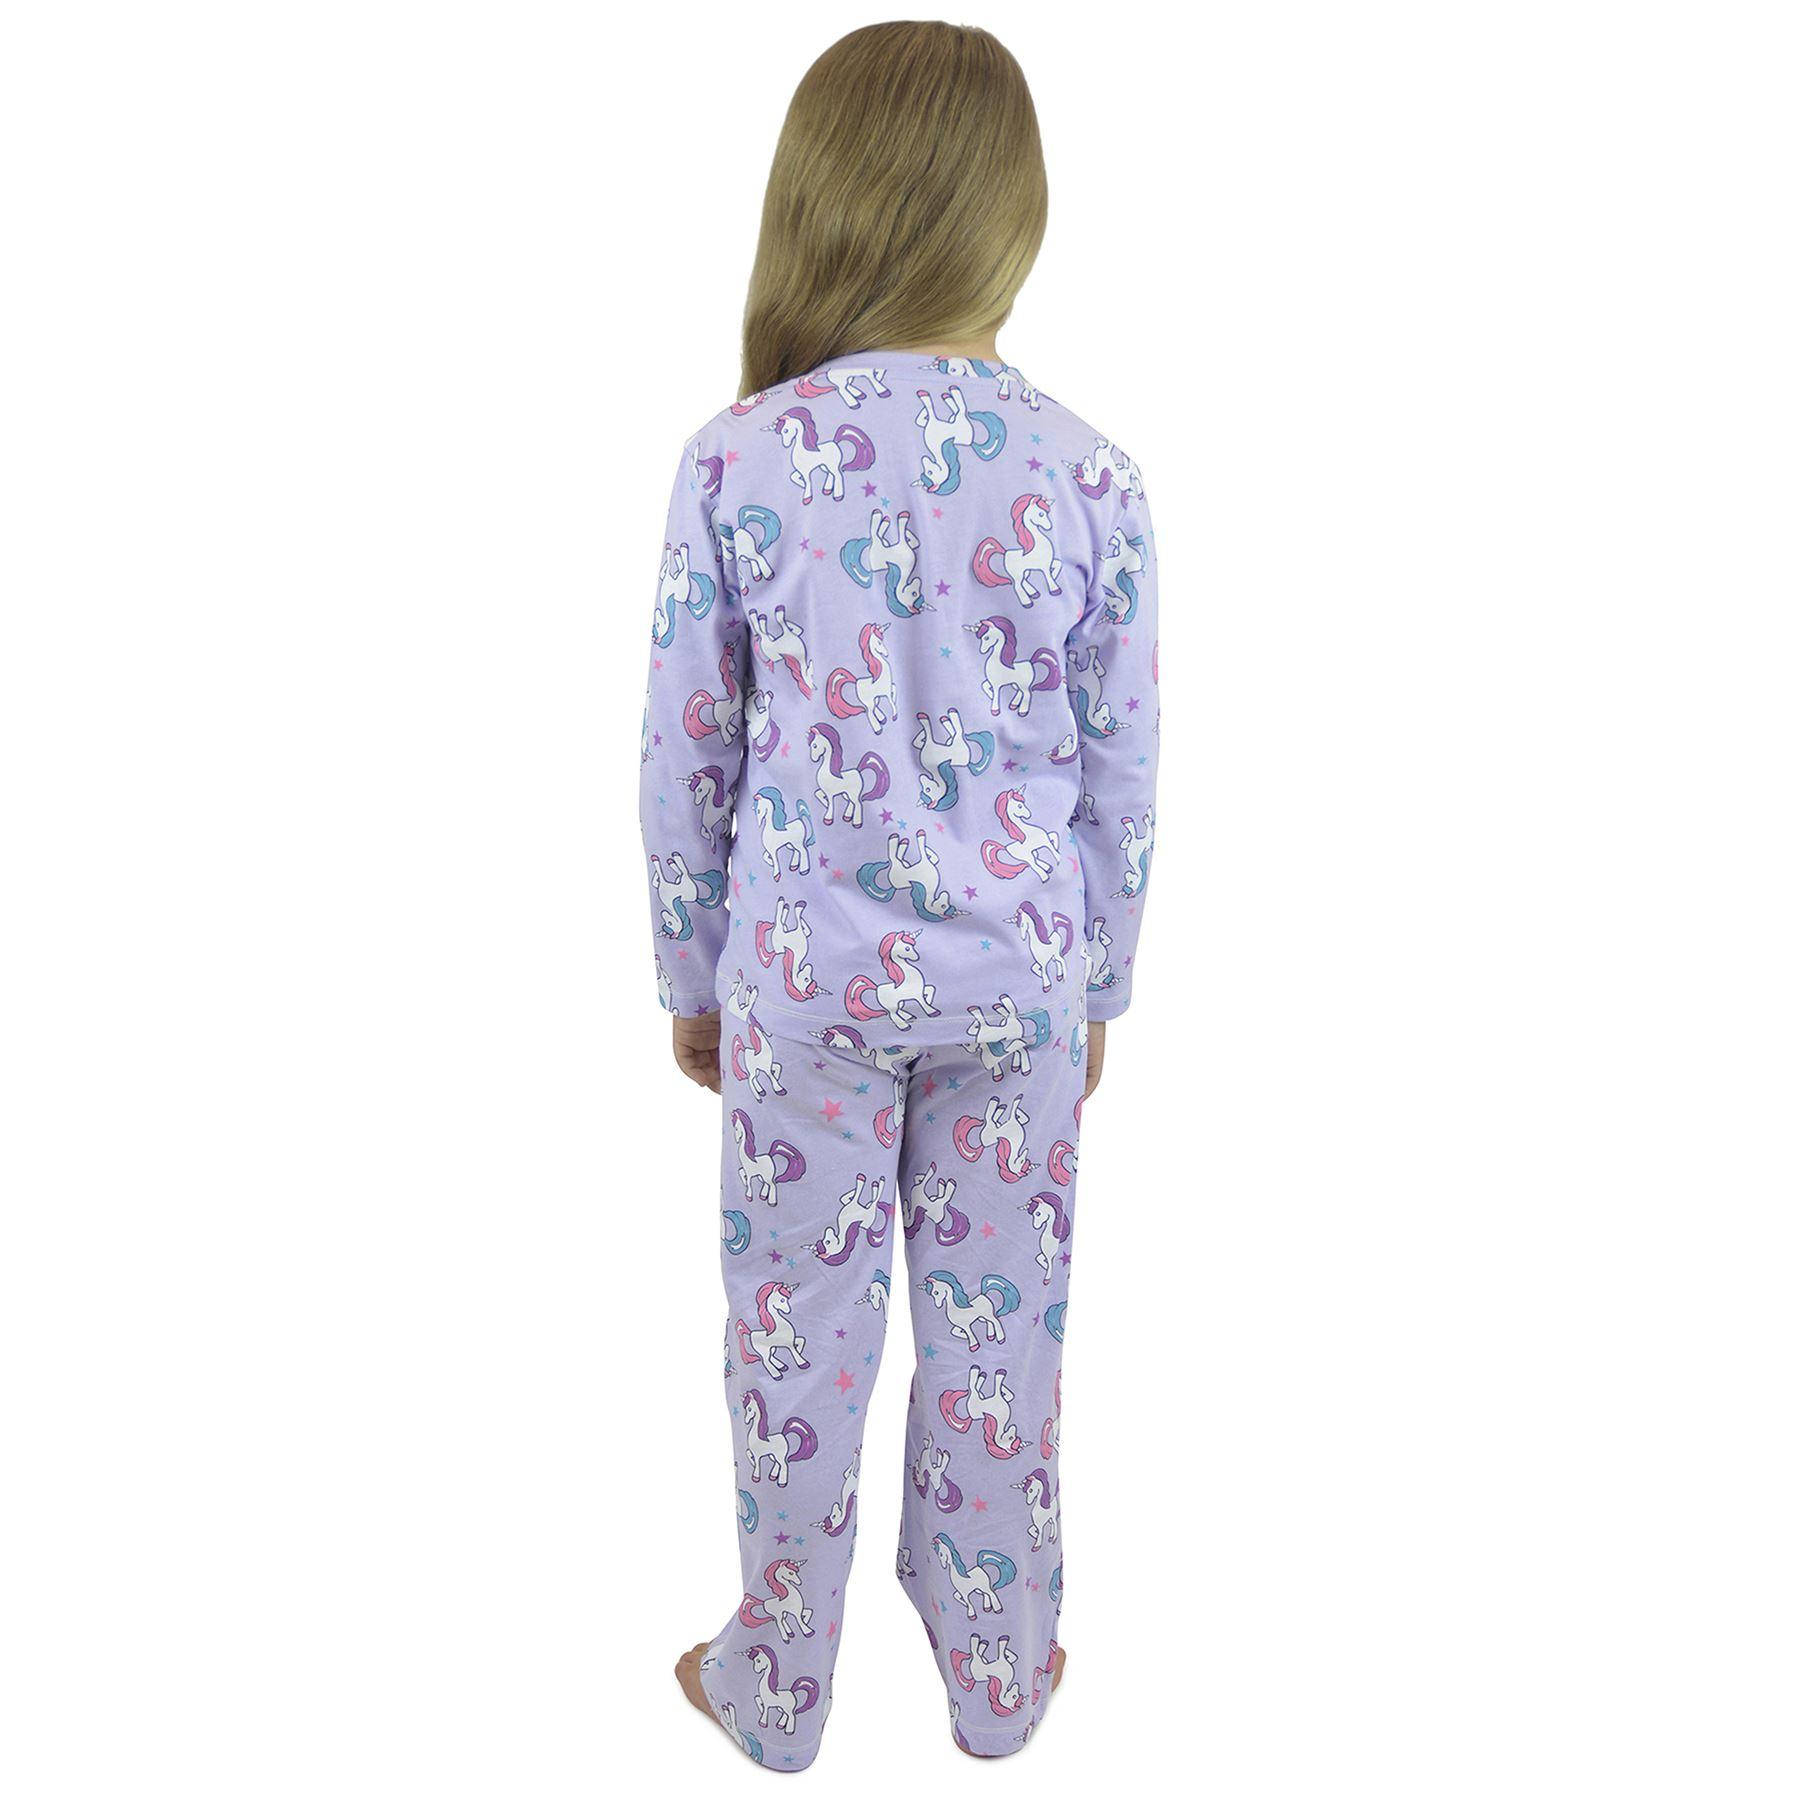 Kids Unicorn /& Pug Girls Pyjama Set Cute Pyjamas PJs Nightwear LN139